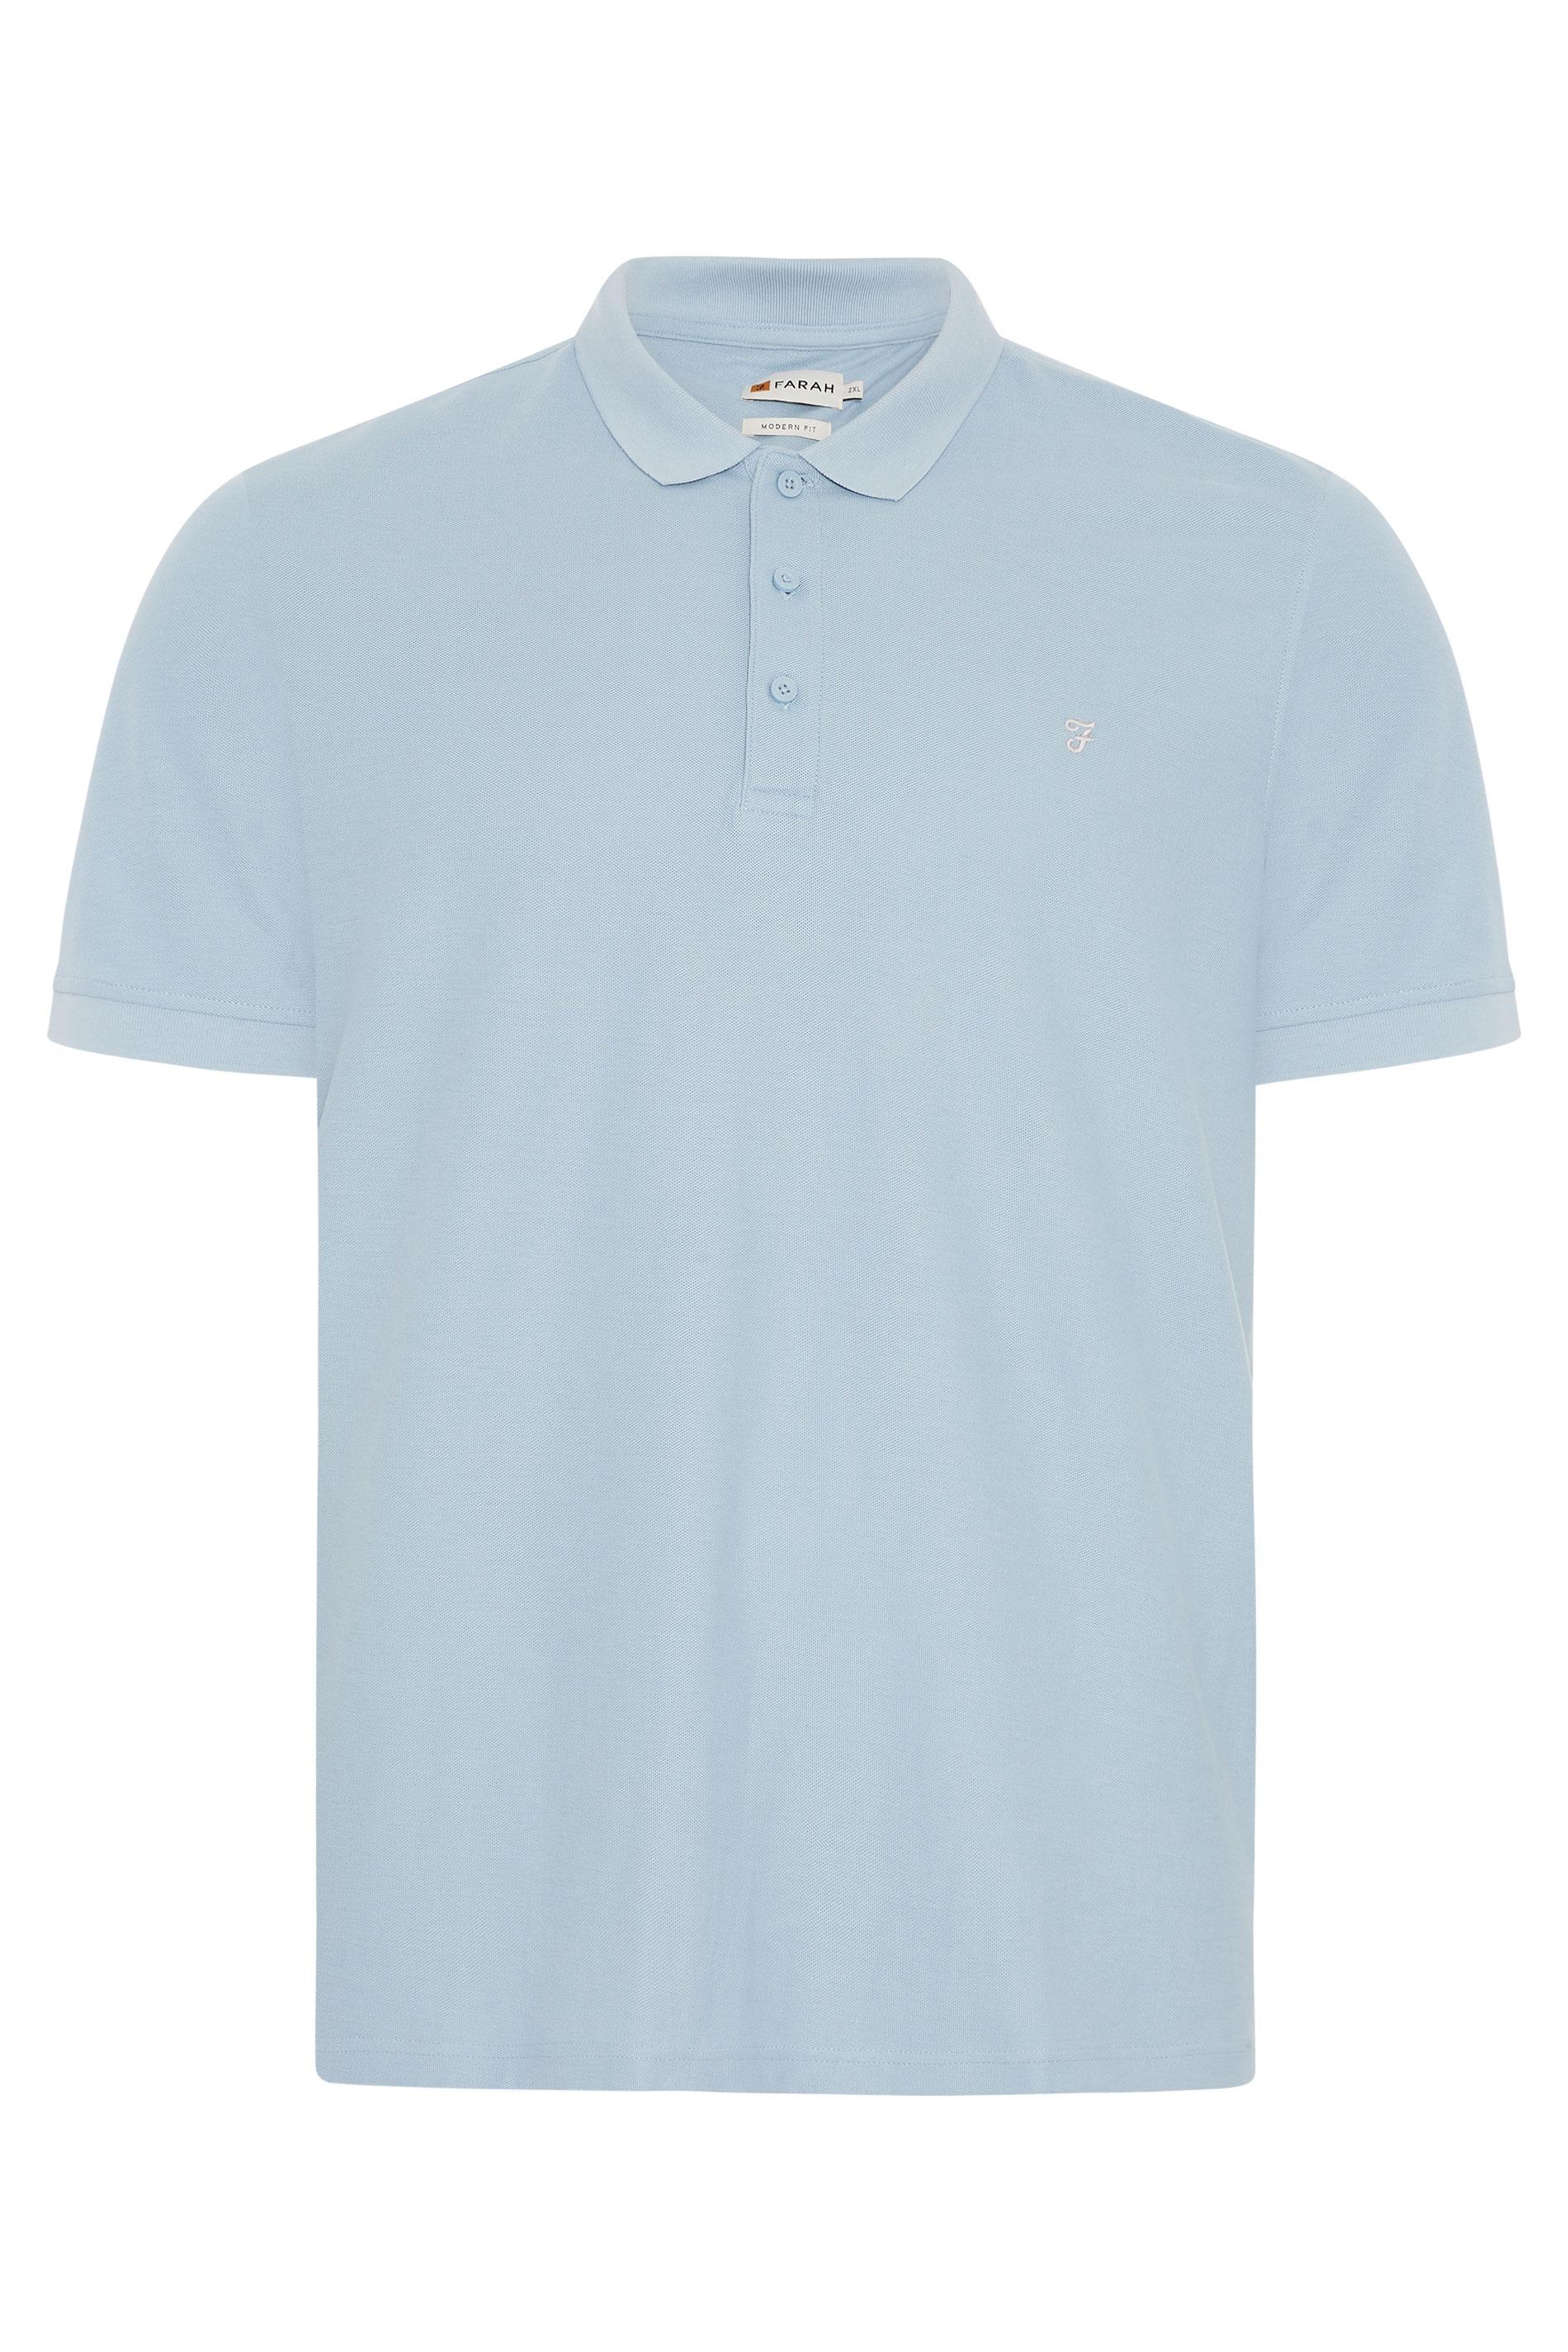 FARAH Blue Polo Shirt